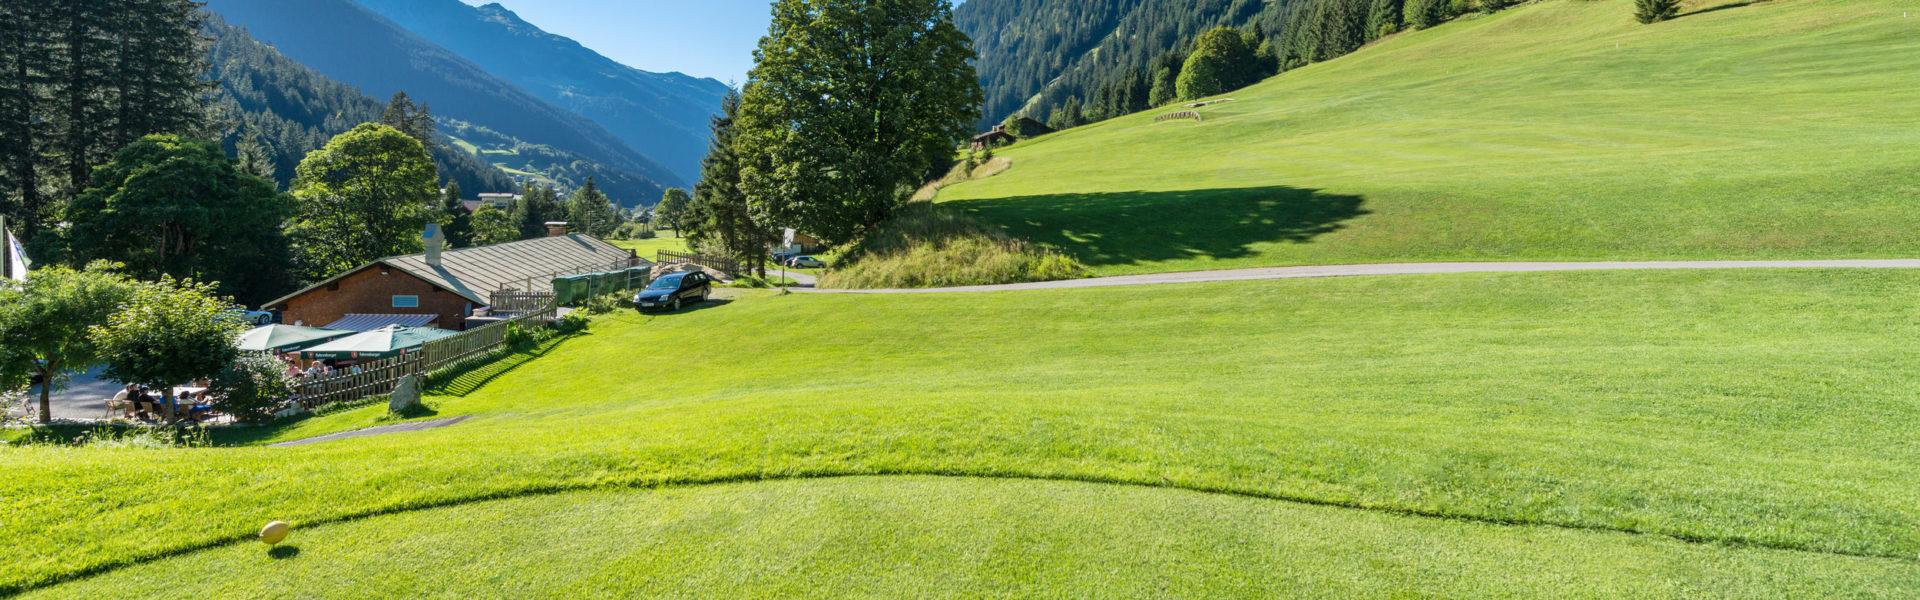 Golfclub Silvretta © Matthias Rhomberg / Vorarlberg Tourismus